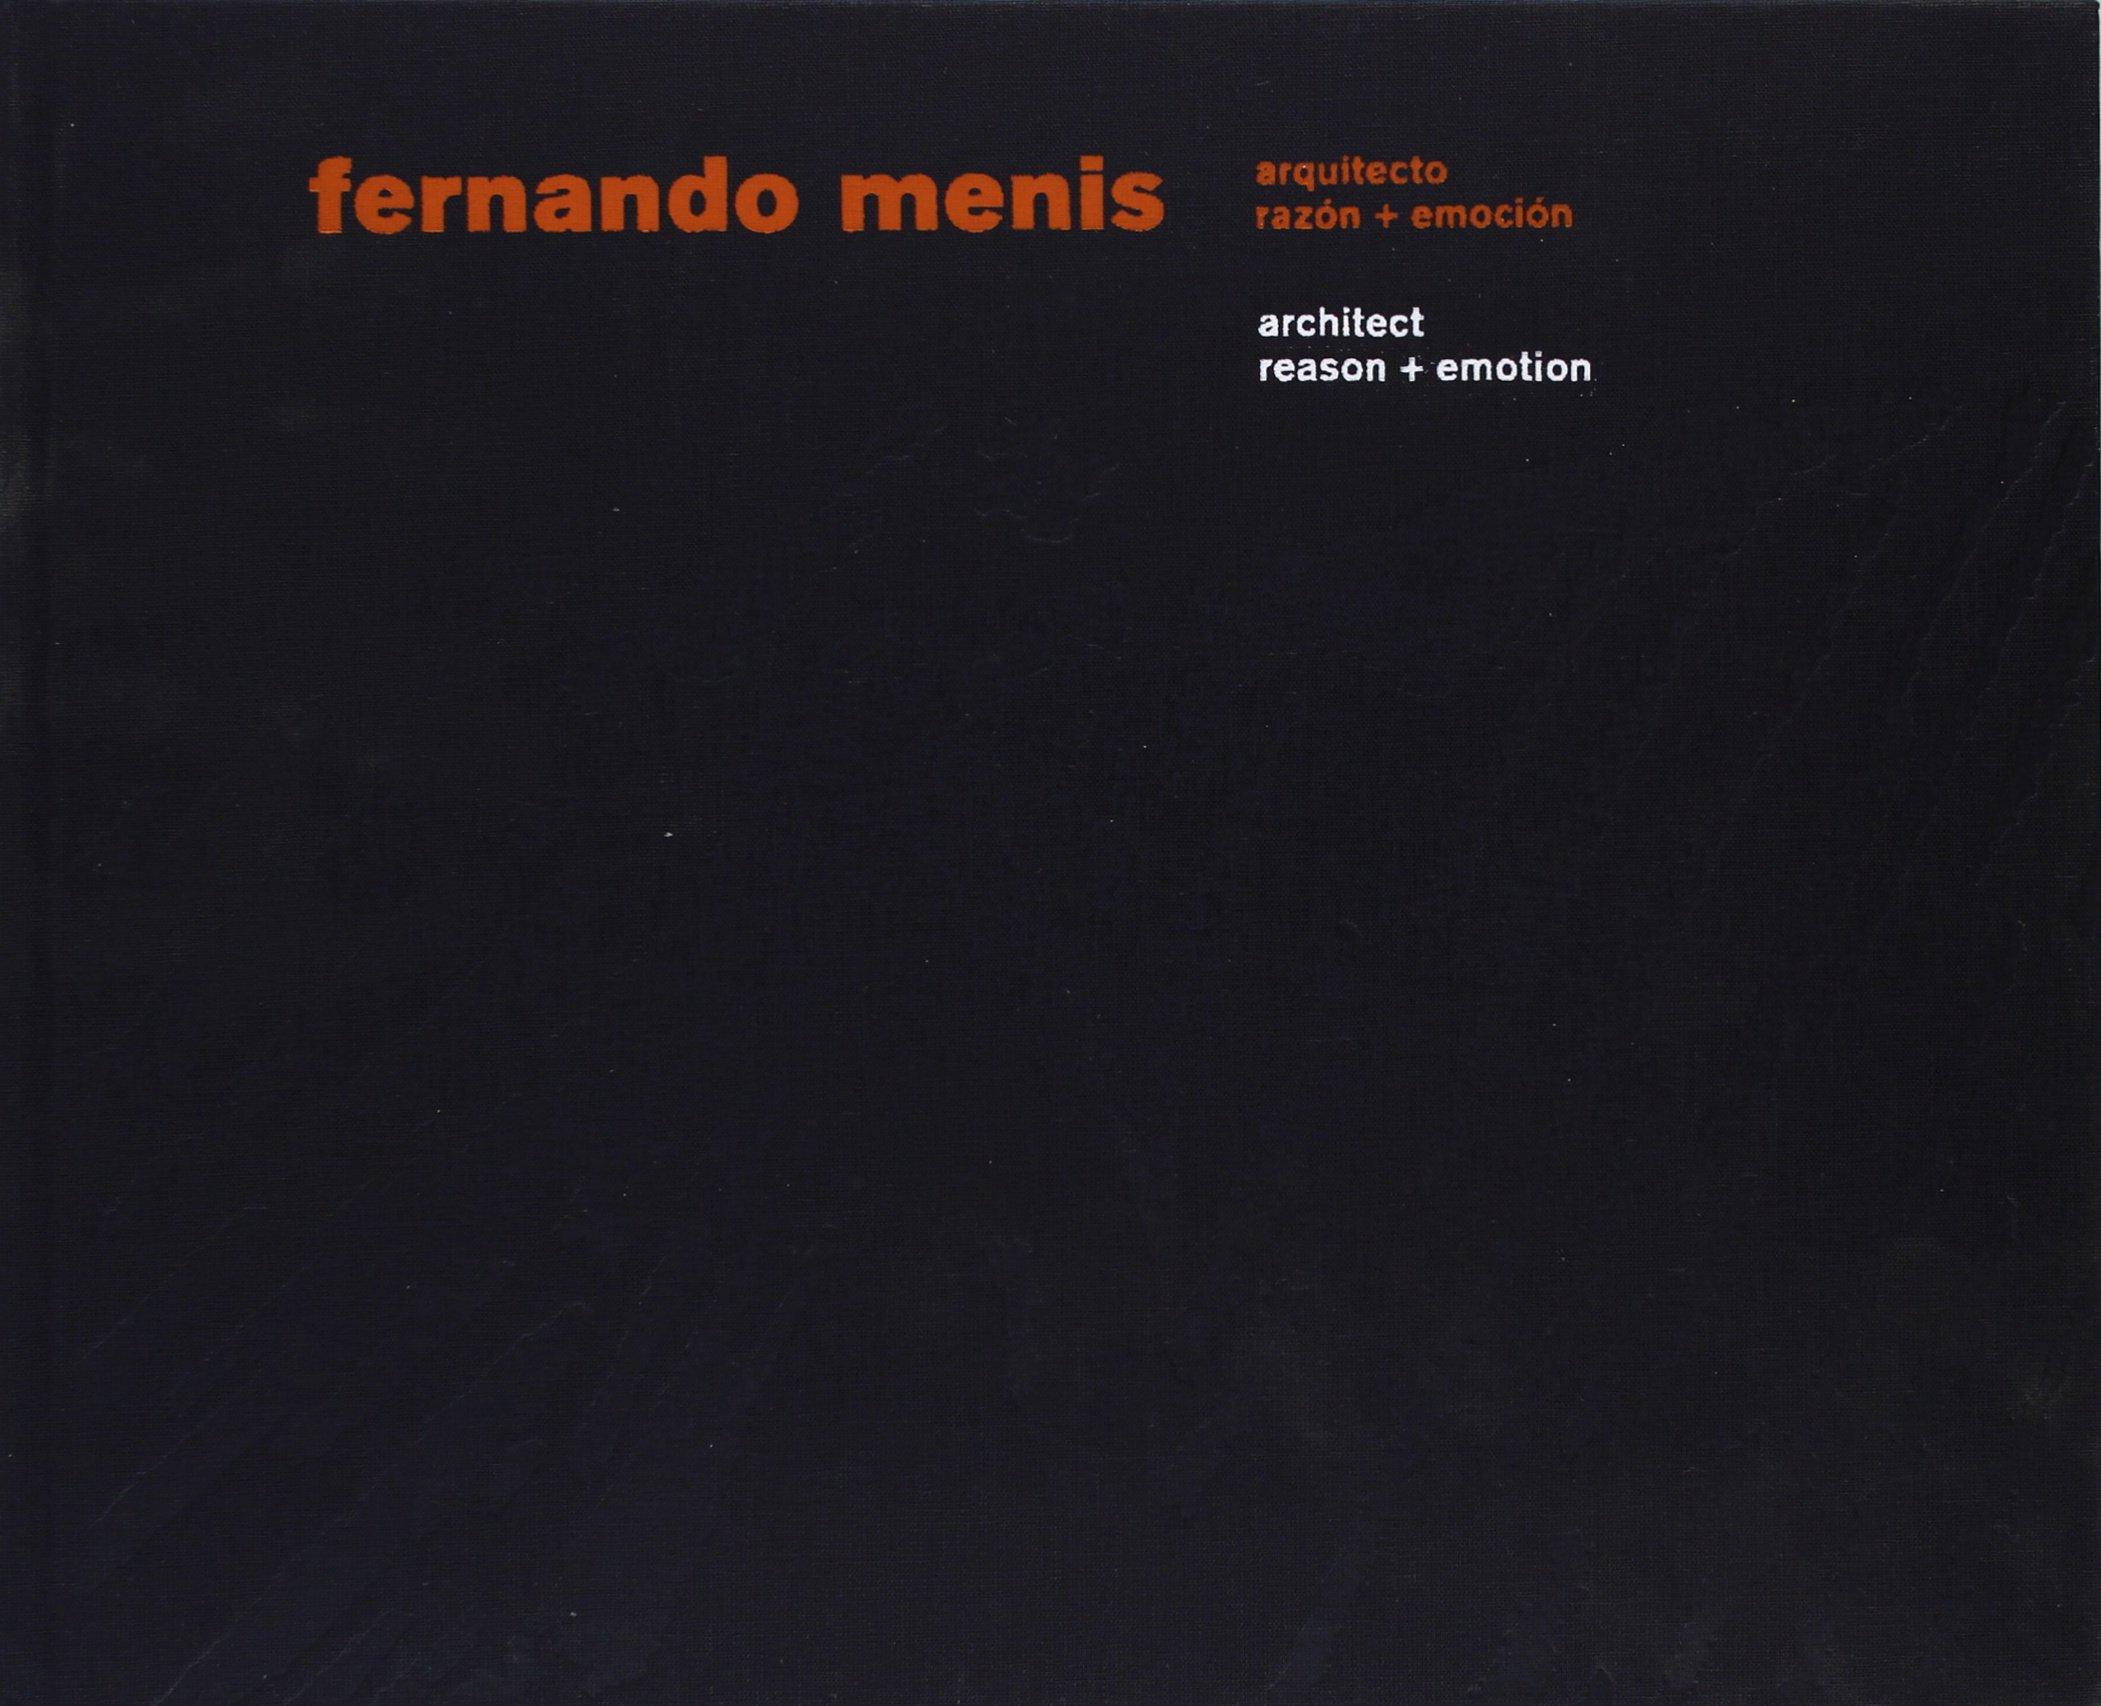 ARQUITECTO (ENG-ESP): Reason + Emotion (ACTAR) (Inglés) Tapa dura – 1 ene 2000 Fernando Menis 8496954269 Buildings - Public Commercial & Industrial